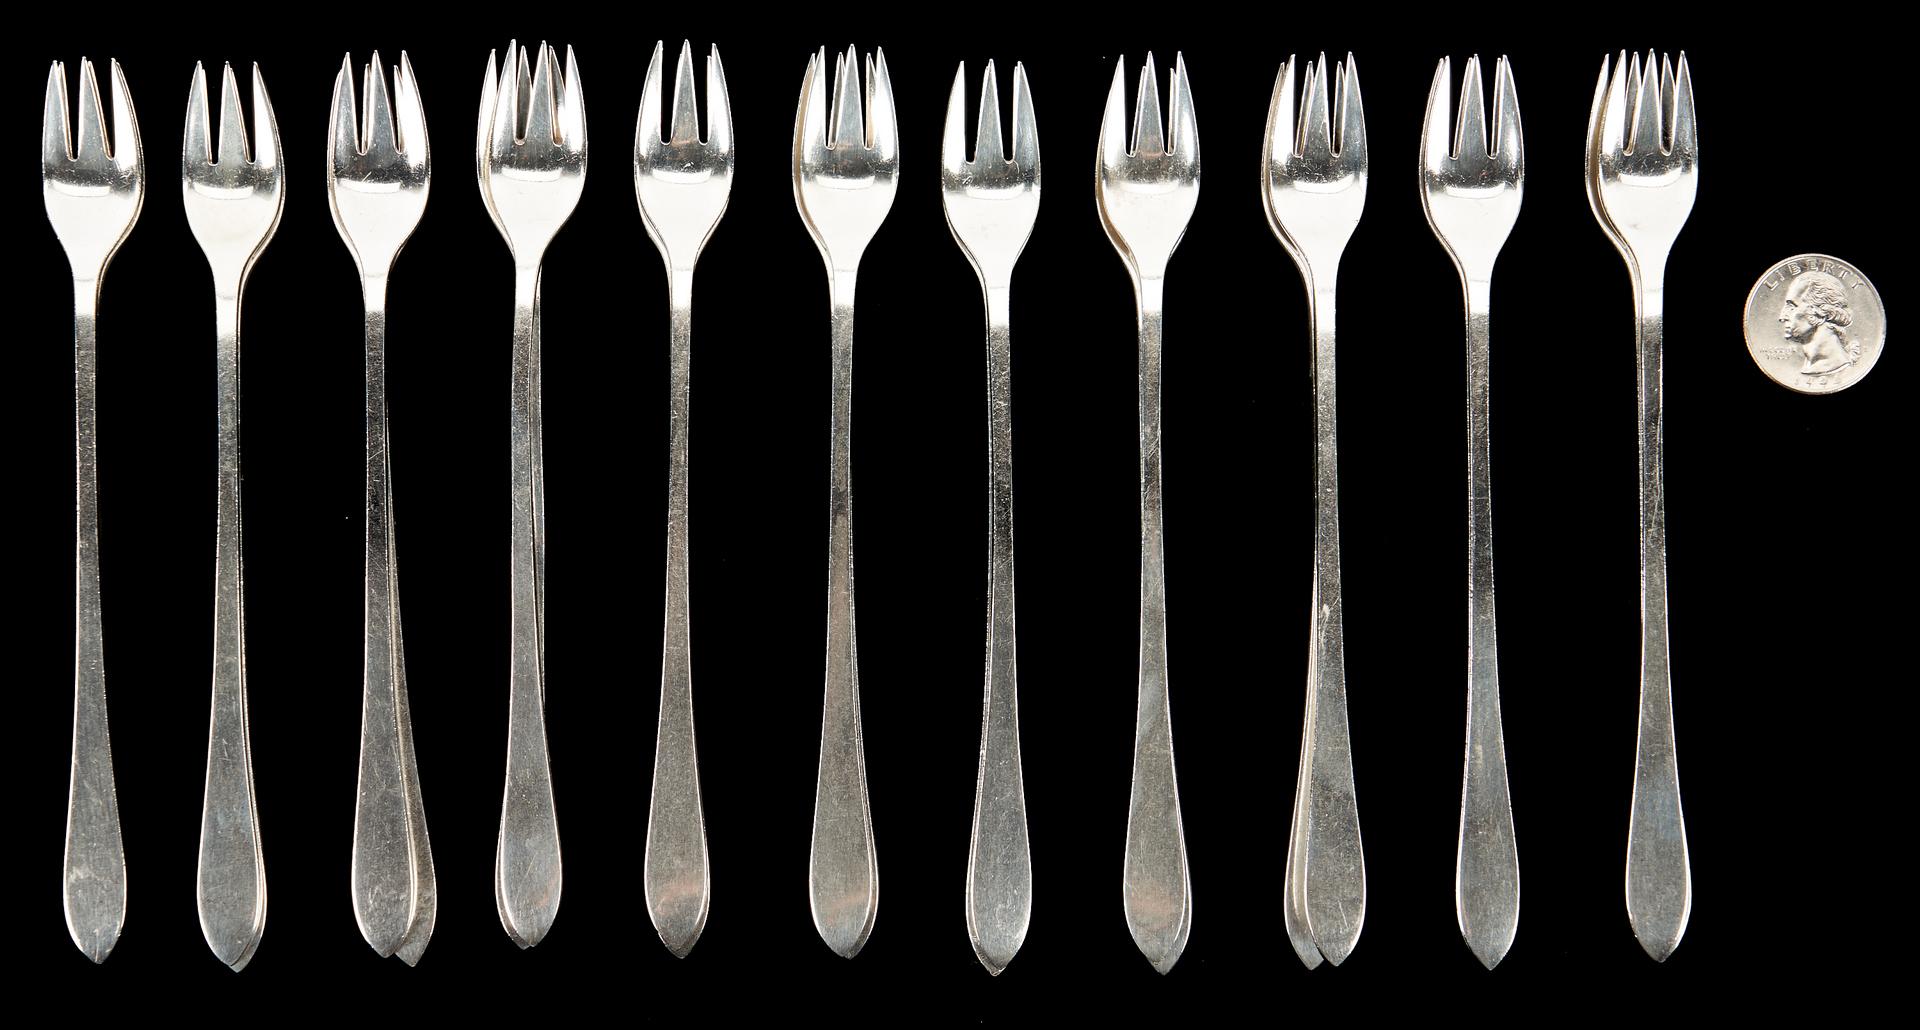 Lot 1222: 22 Tiffany Fanueil Pattern Sterling Cocktail Forks